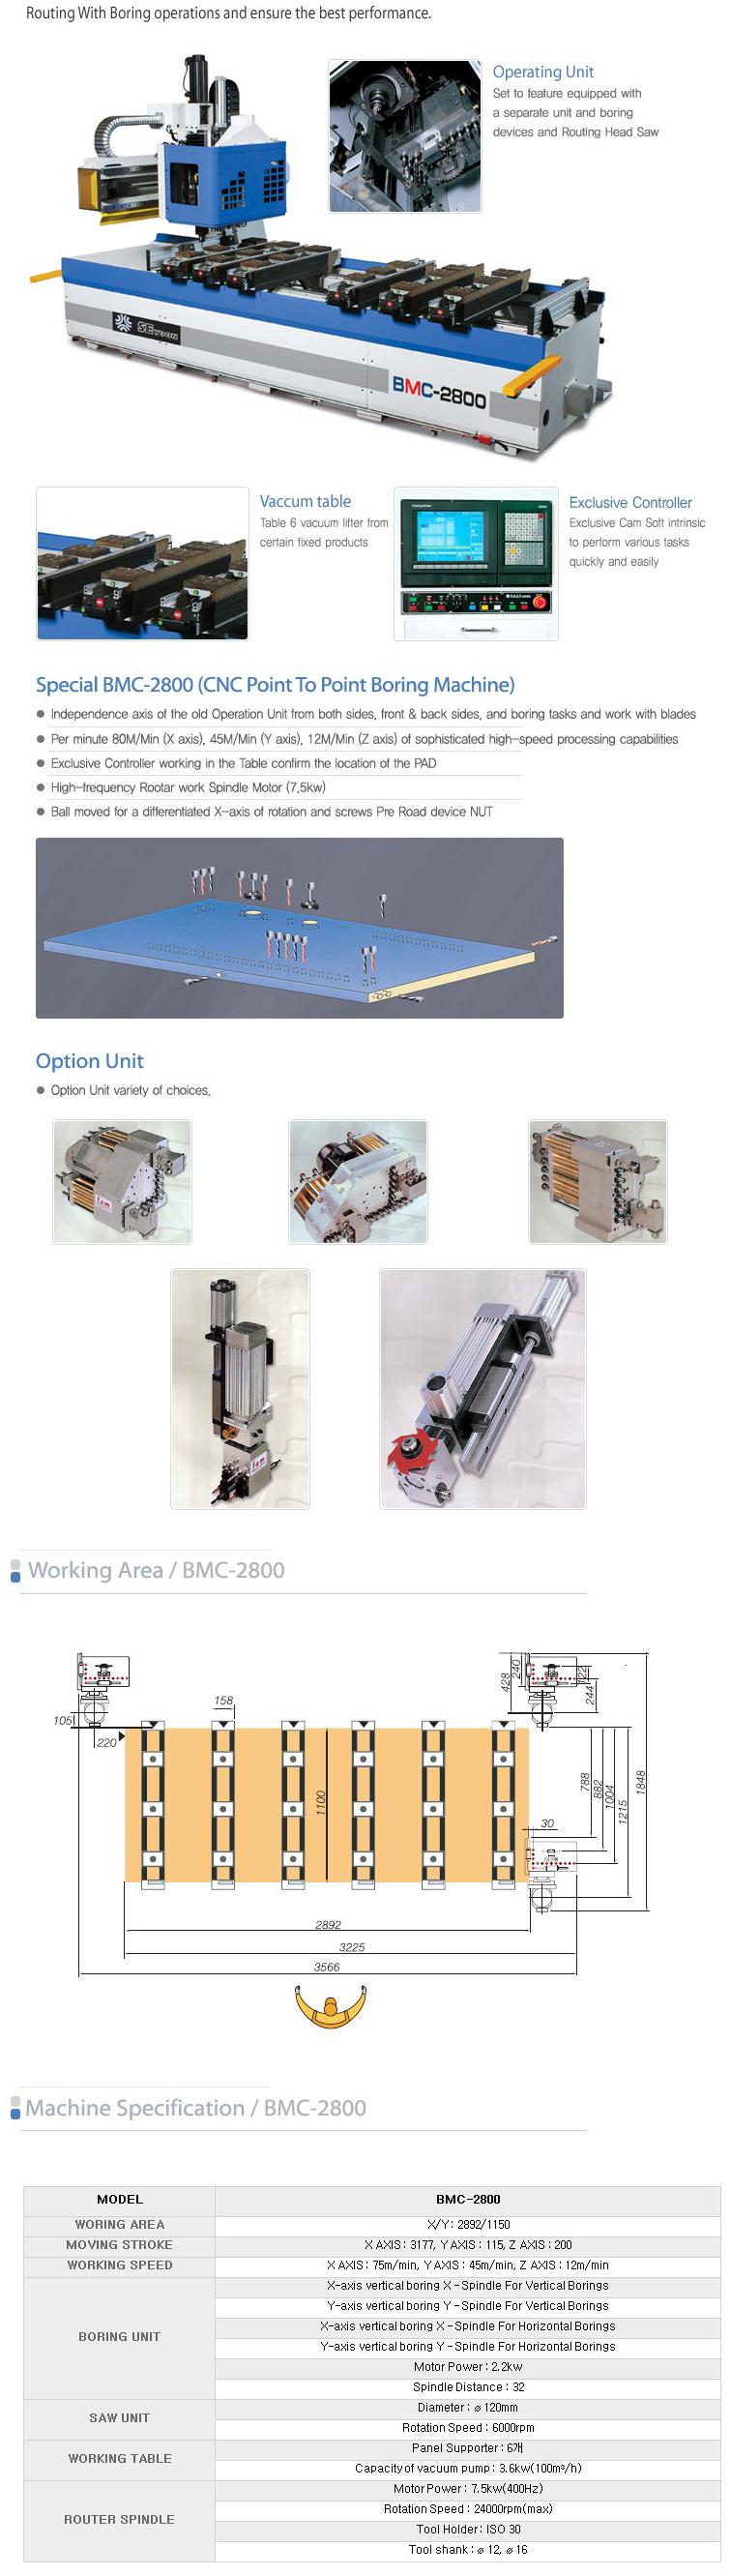 SEYOON NST CNC Point to Point Boring Machine BMC-2800